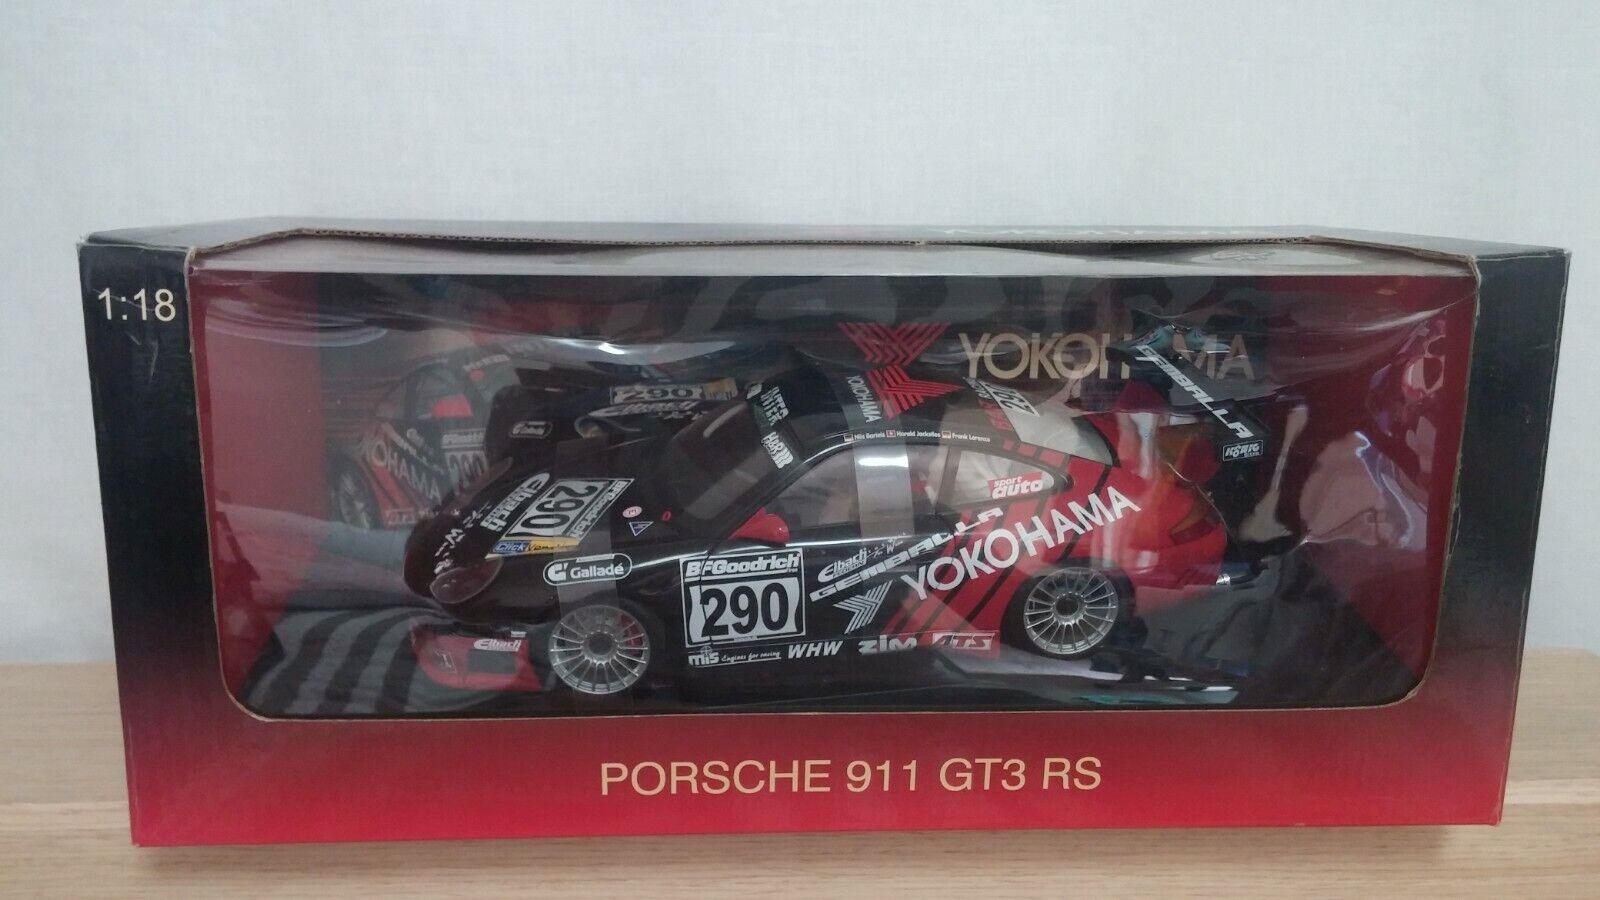 1/18 Autoart Porsche 911 996 GT3 RS YOKOHAMA